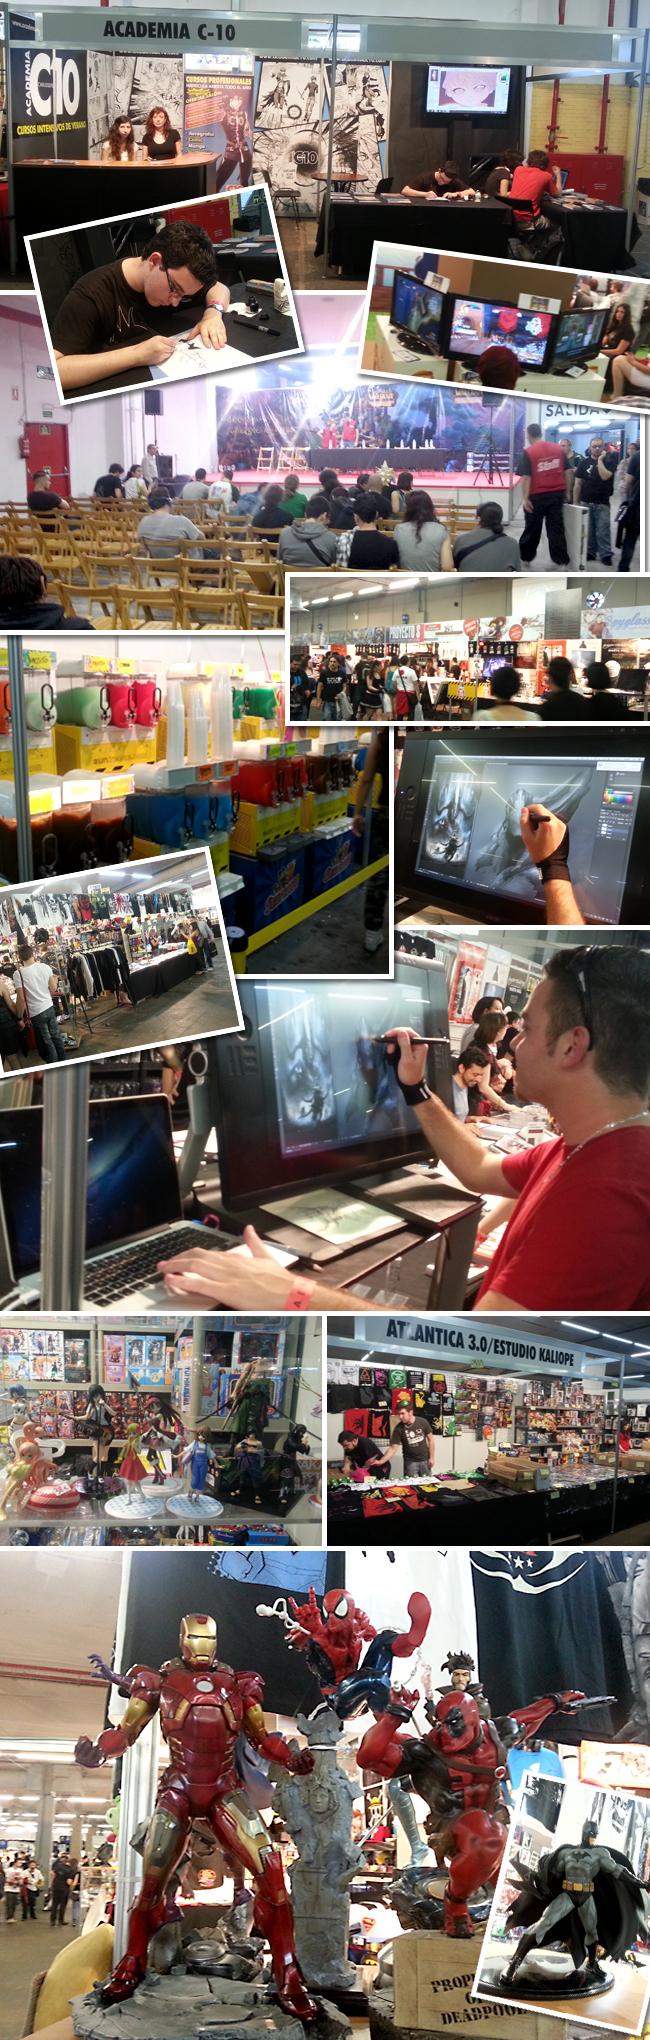 expomanga 2013 articulos de super heroes manga comic madrid